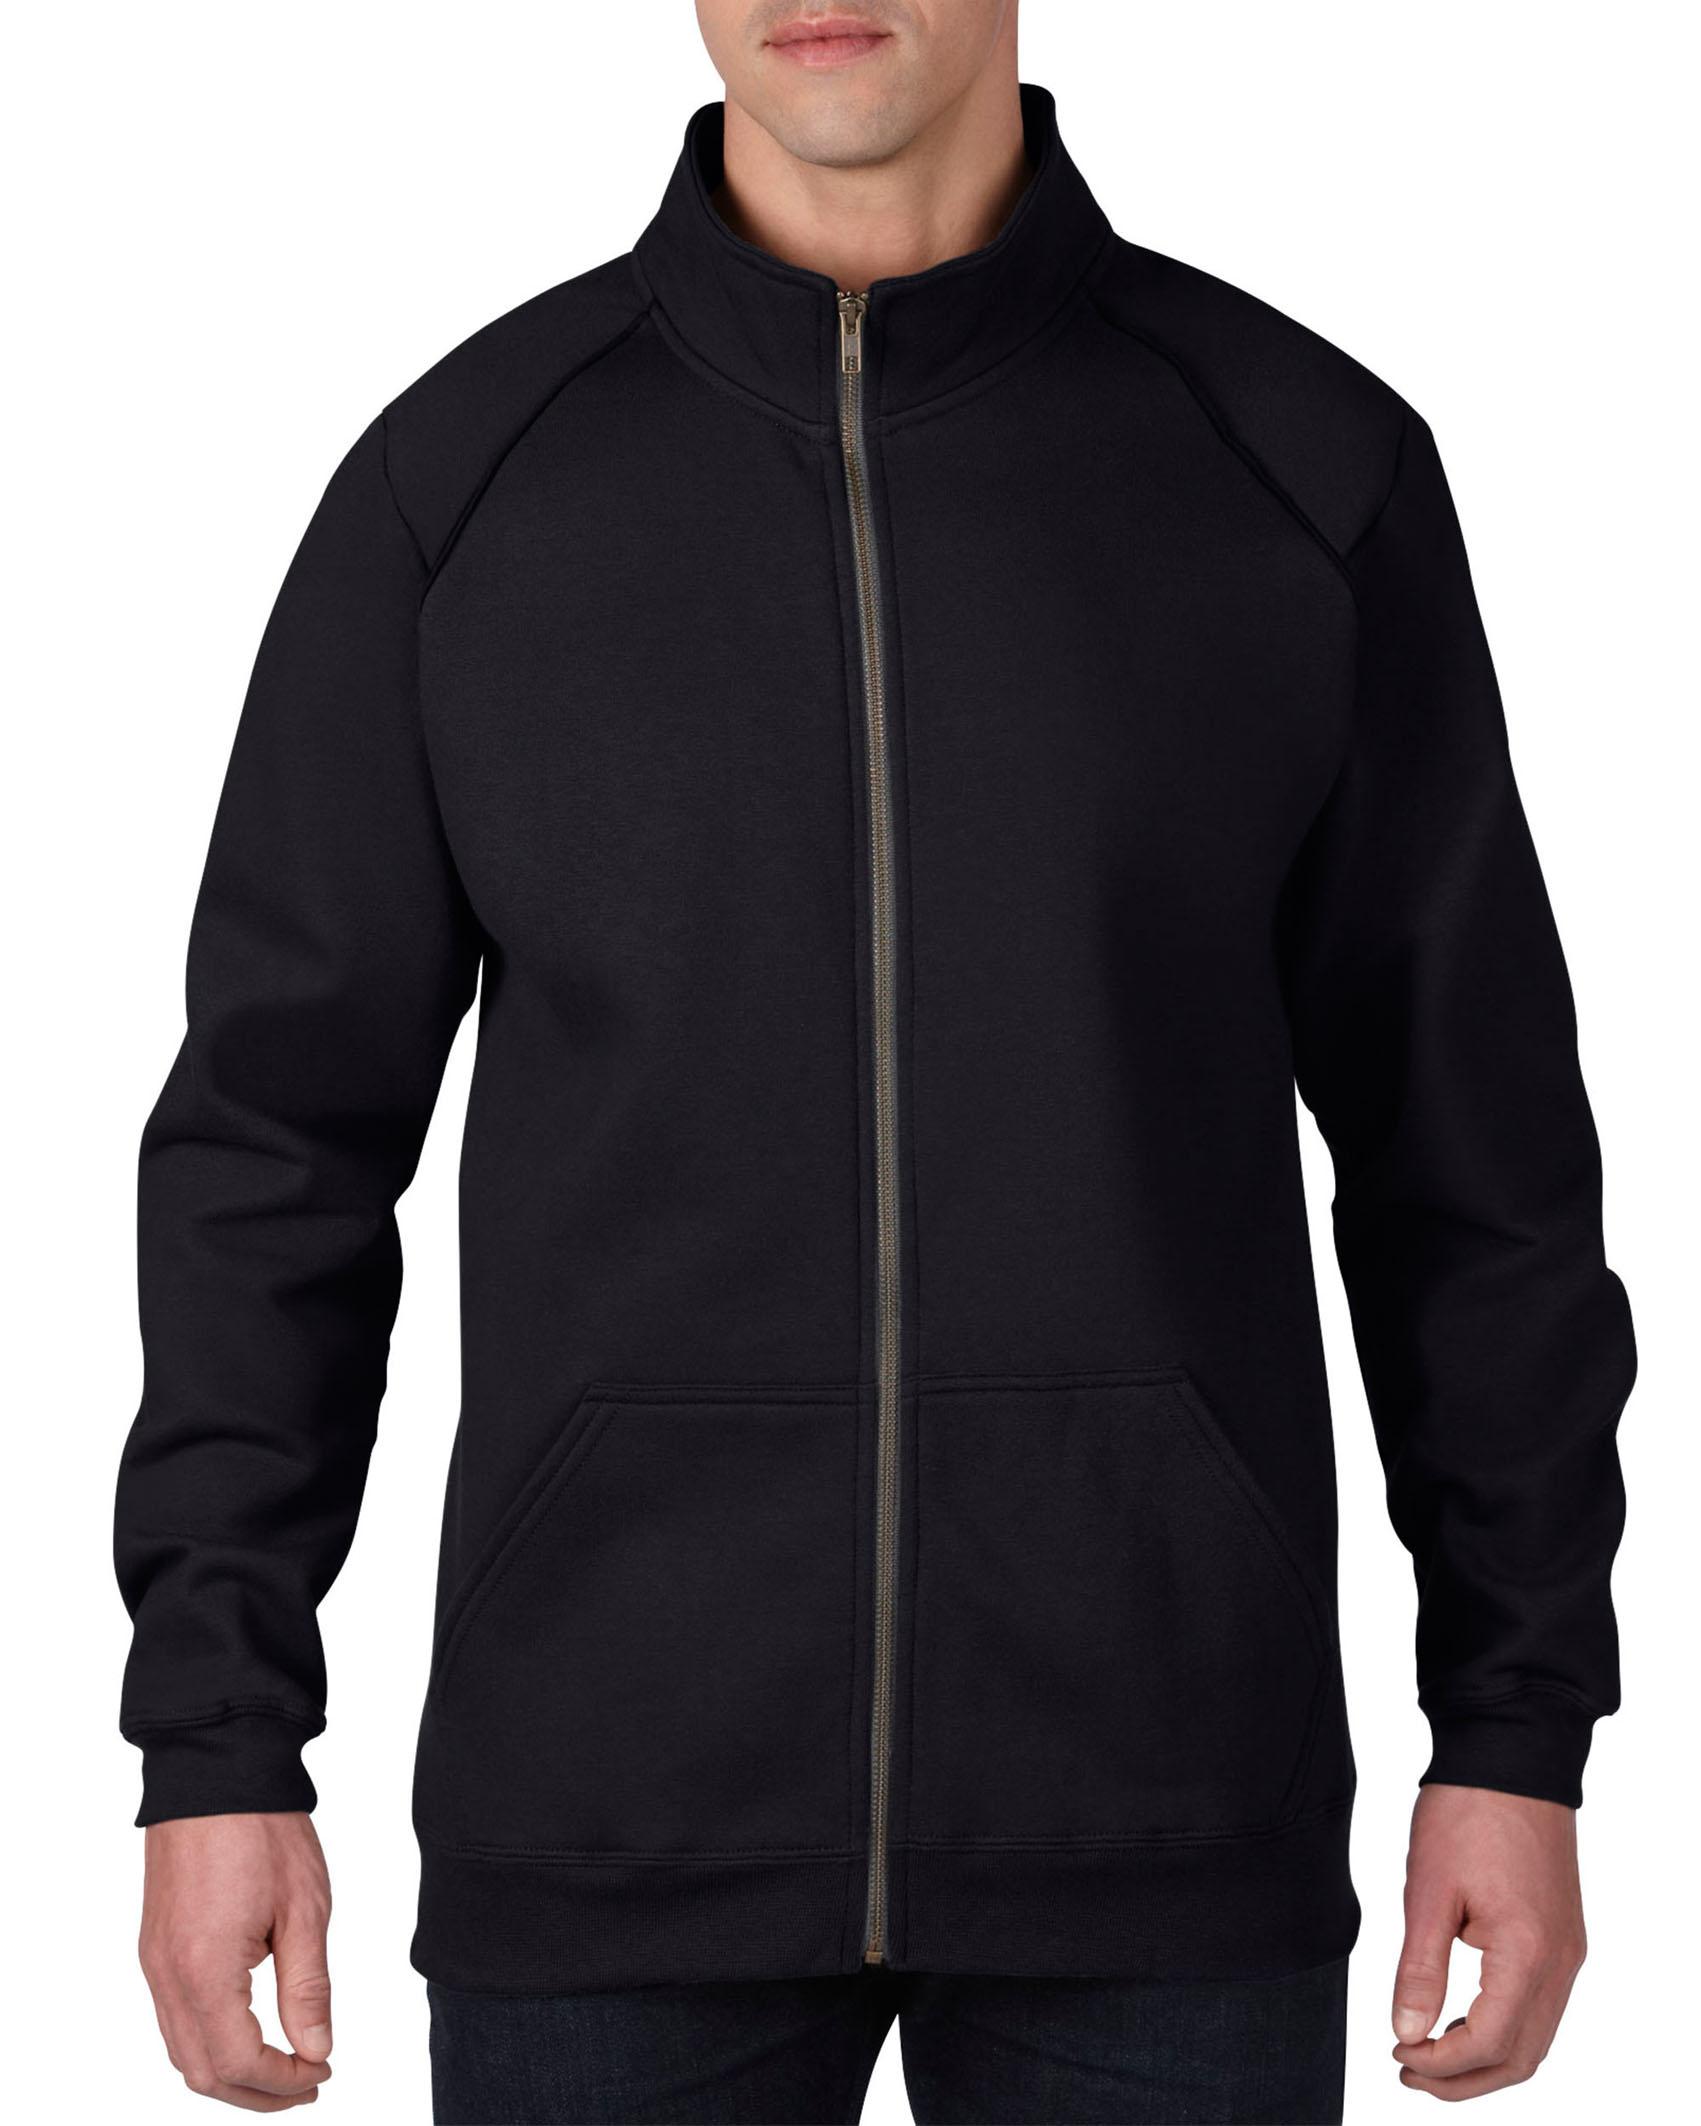 Gildan Sweater Full Zip Premium Cotton